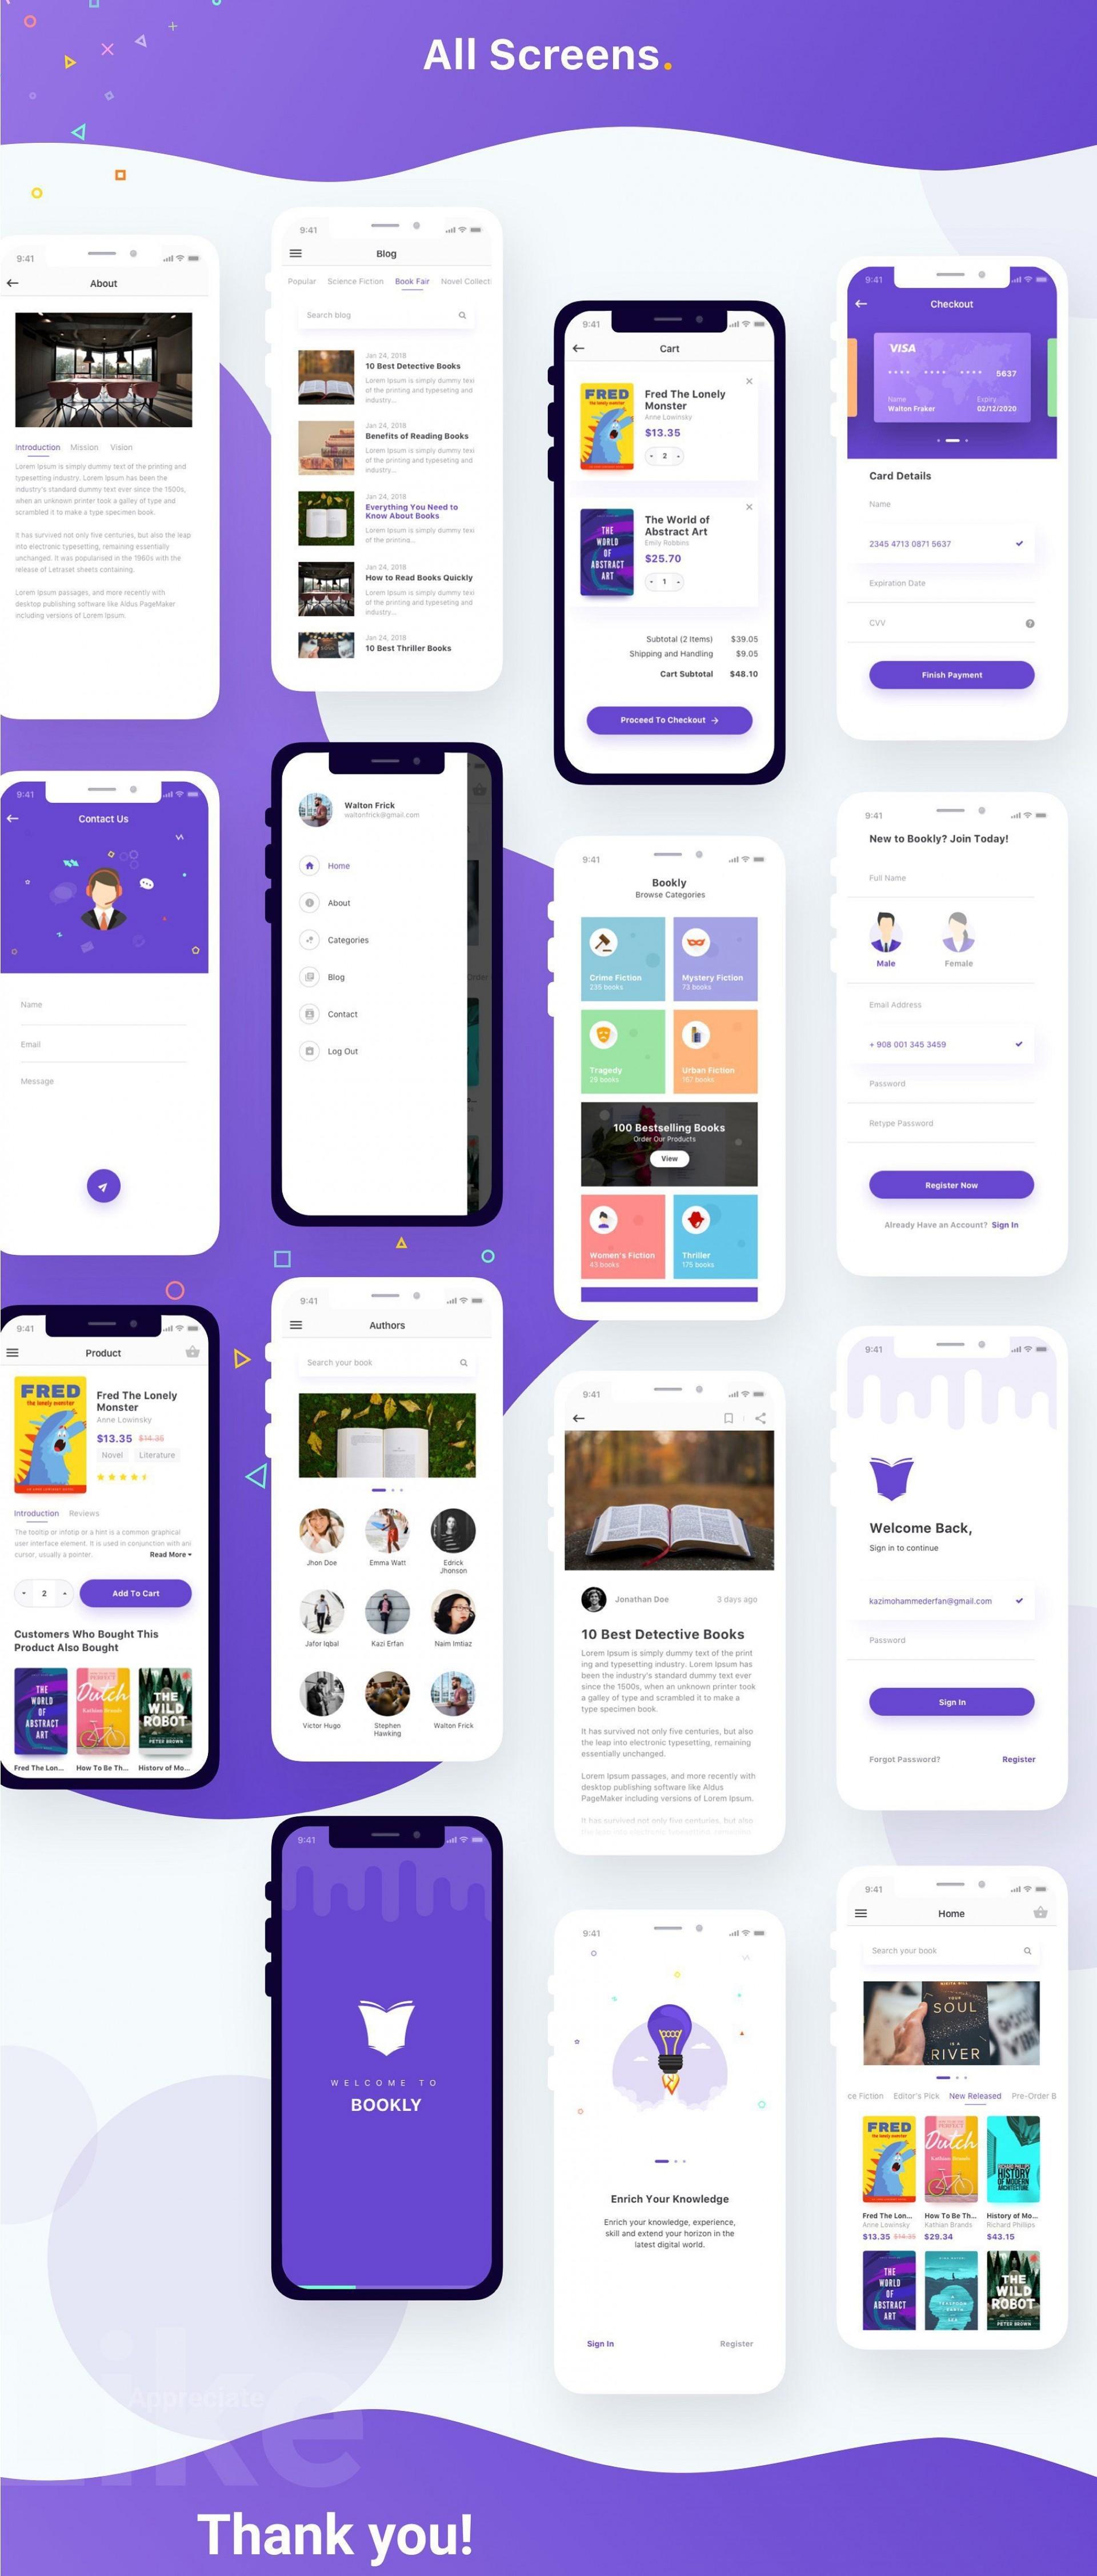 001 Fantastic Iphone App Design Template High Def  Templates Io Sketch Psd Free Download1920